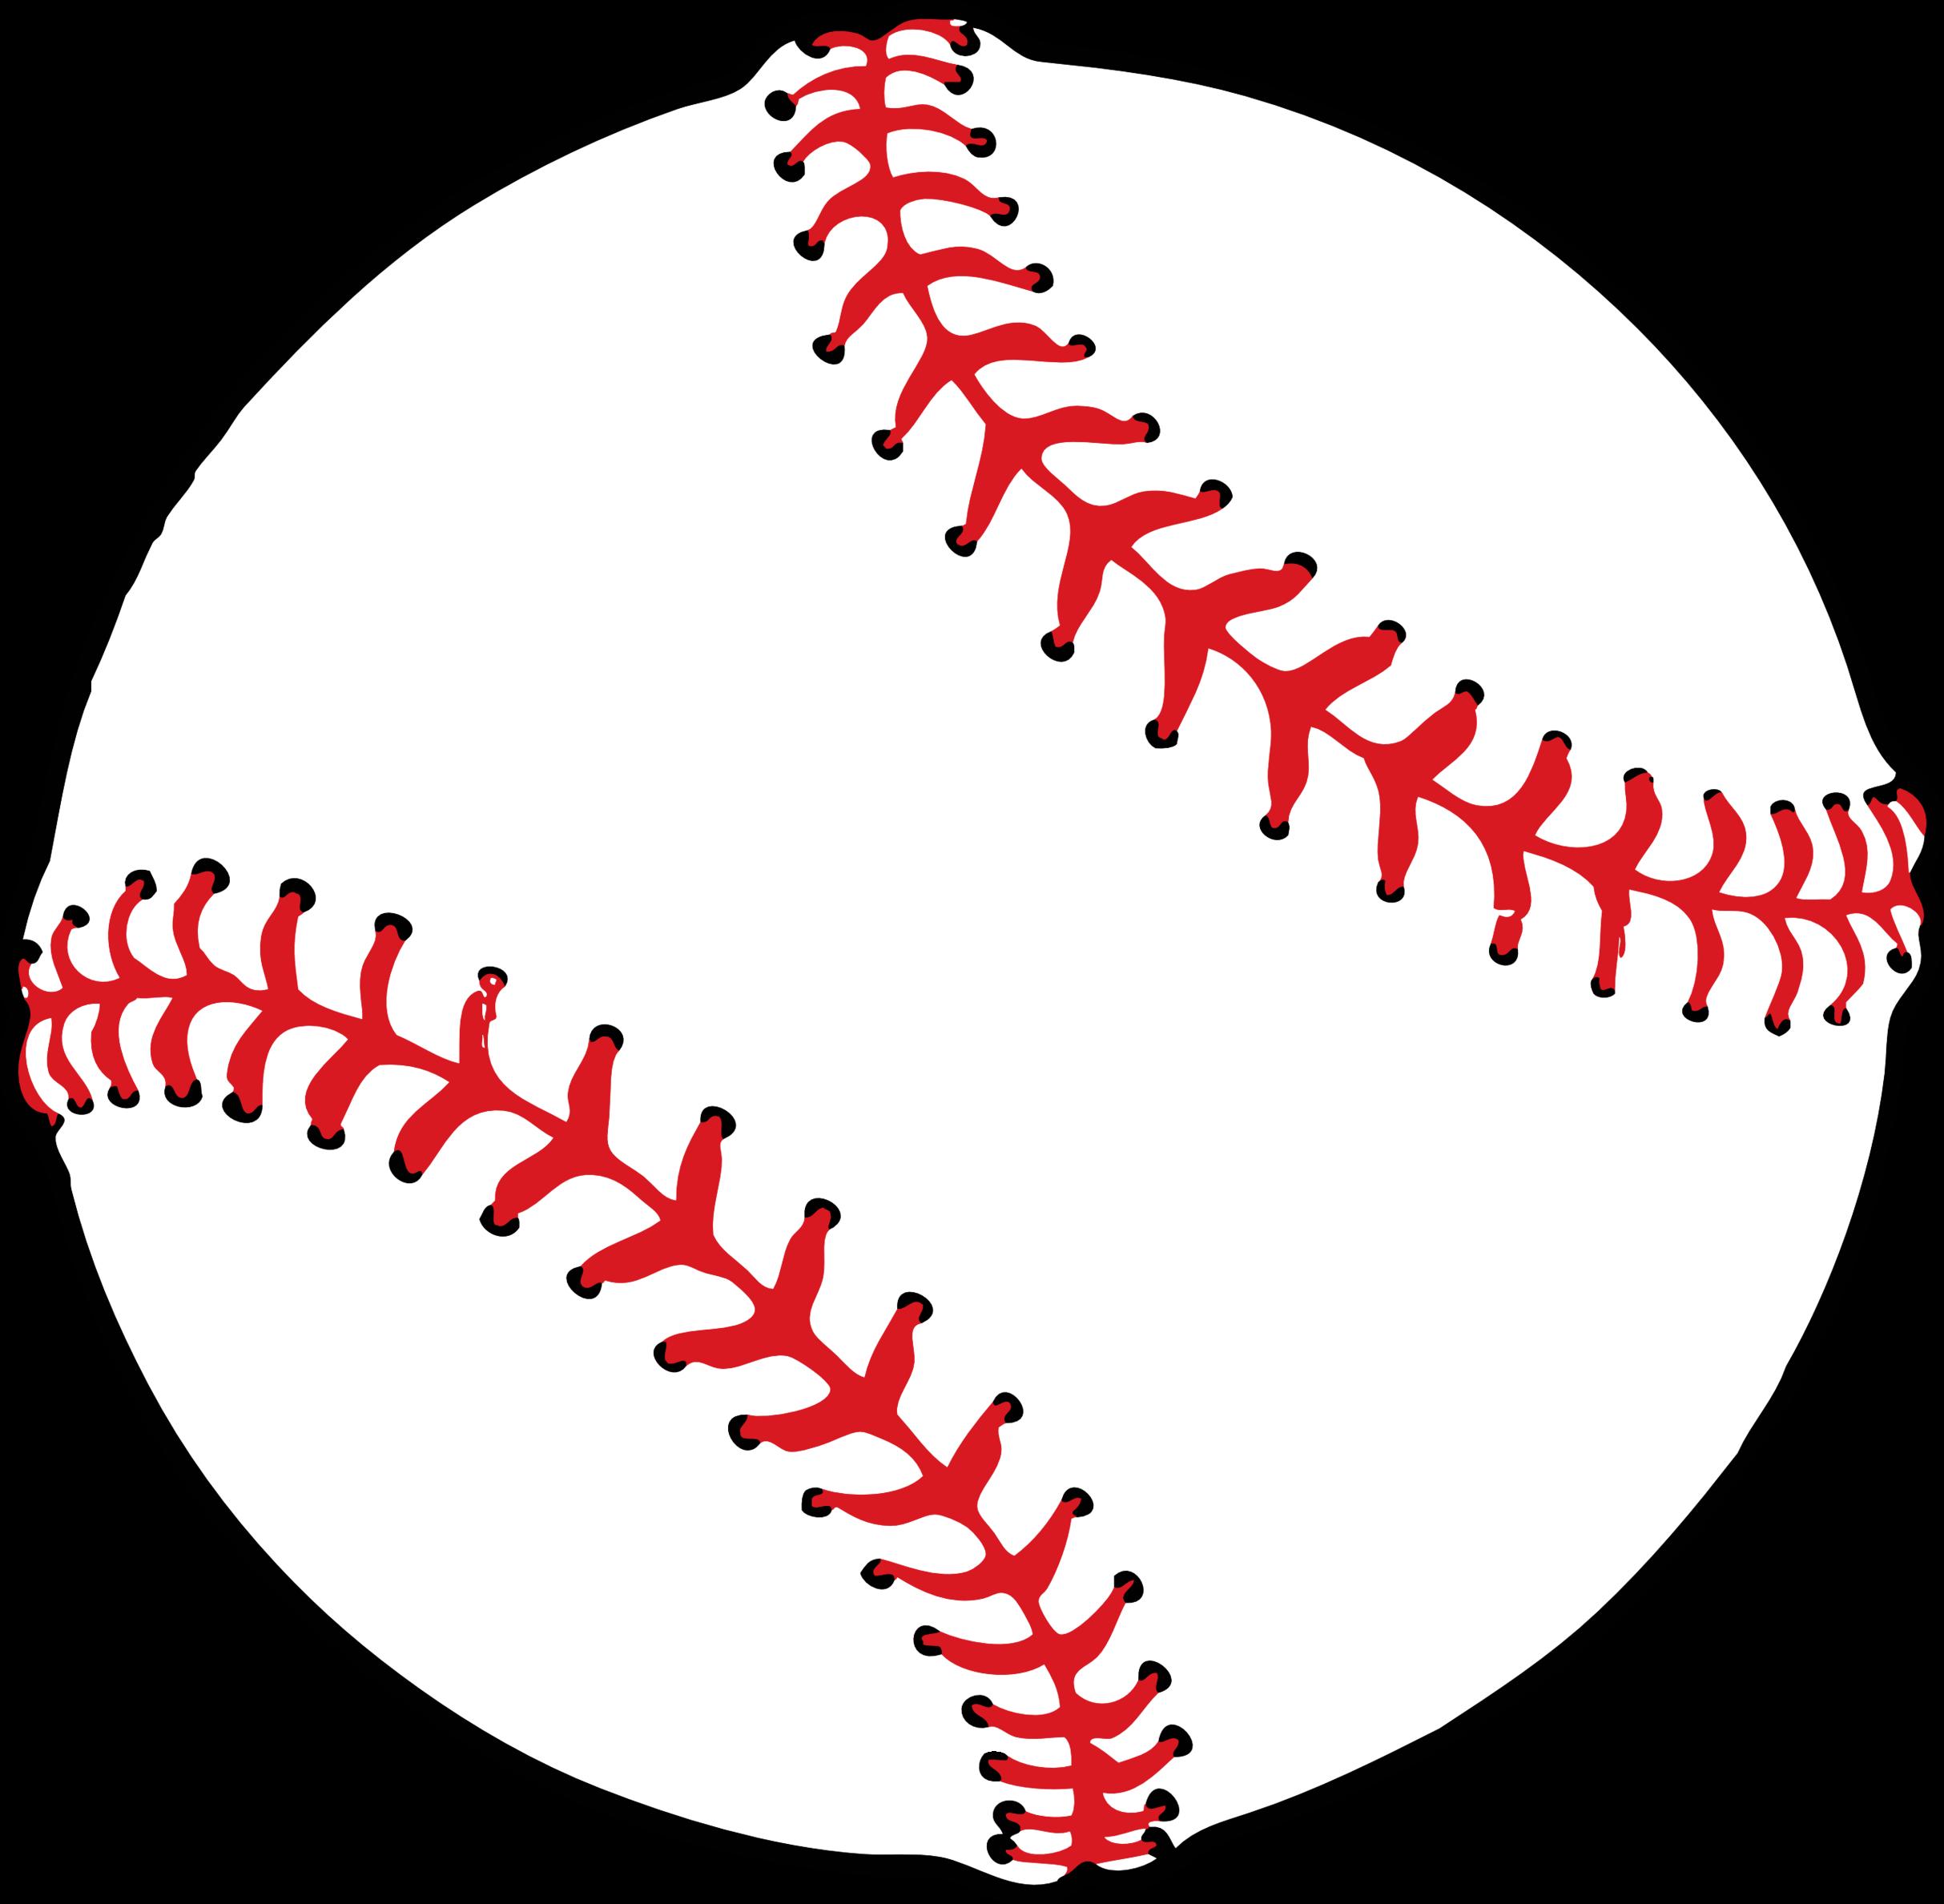 Baseball clipart dodgers #2